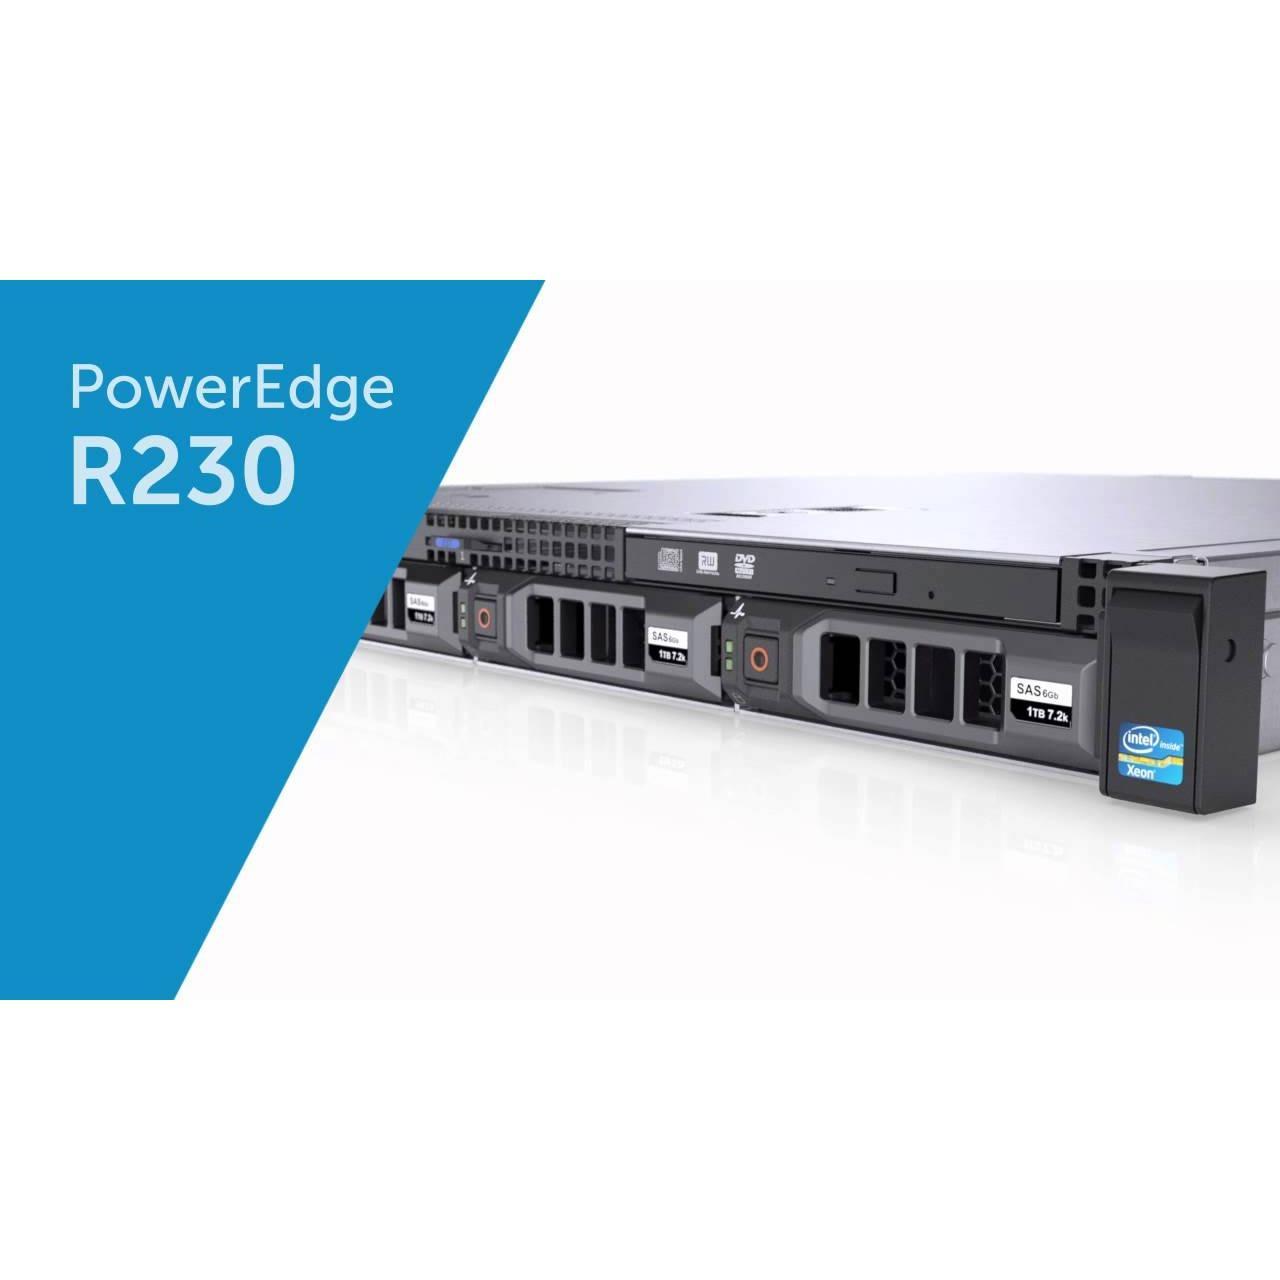 New PowerEdge R230 Rack ServerIntel Xeon E3-1220 v5 3.0GHz, 8M cache, 4C/4T, turbo (80W) RAM 8GB UDIMM, 2400MT/s 1TB HDD WINDOWS 10 PROFESSIONAL